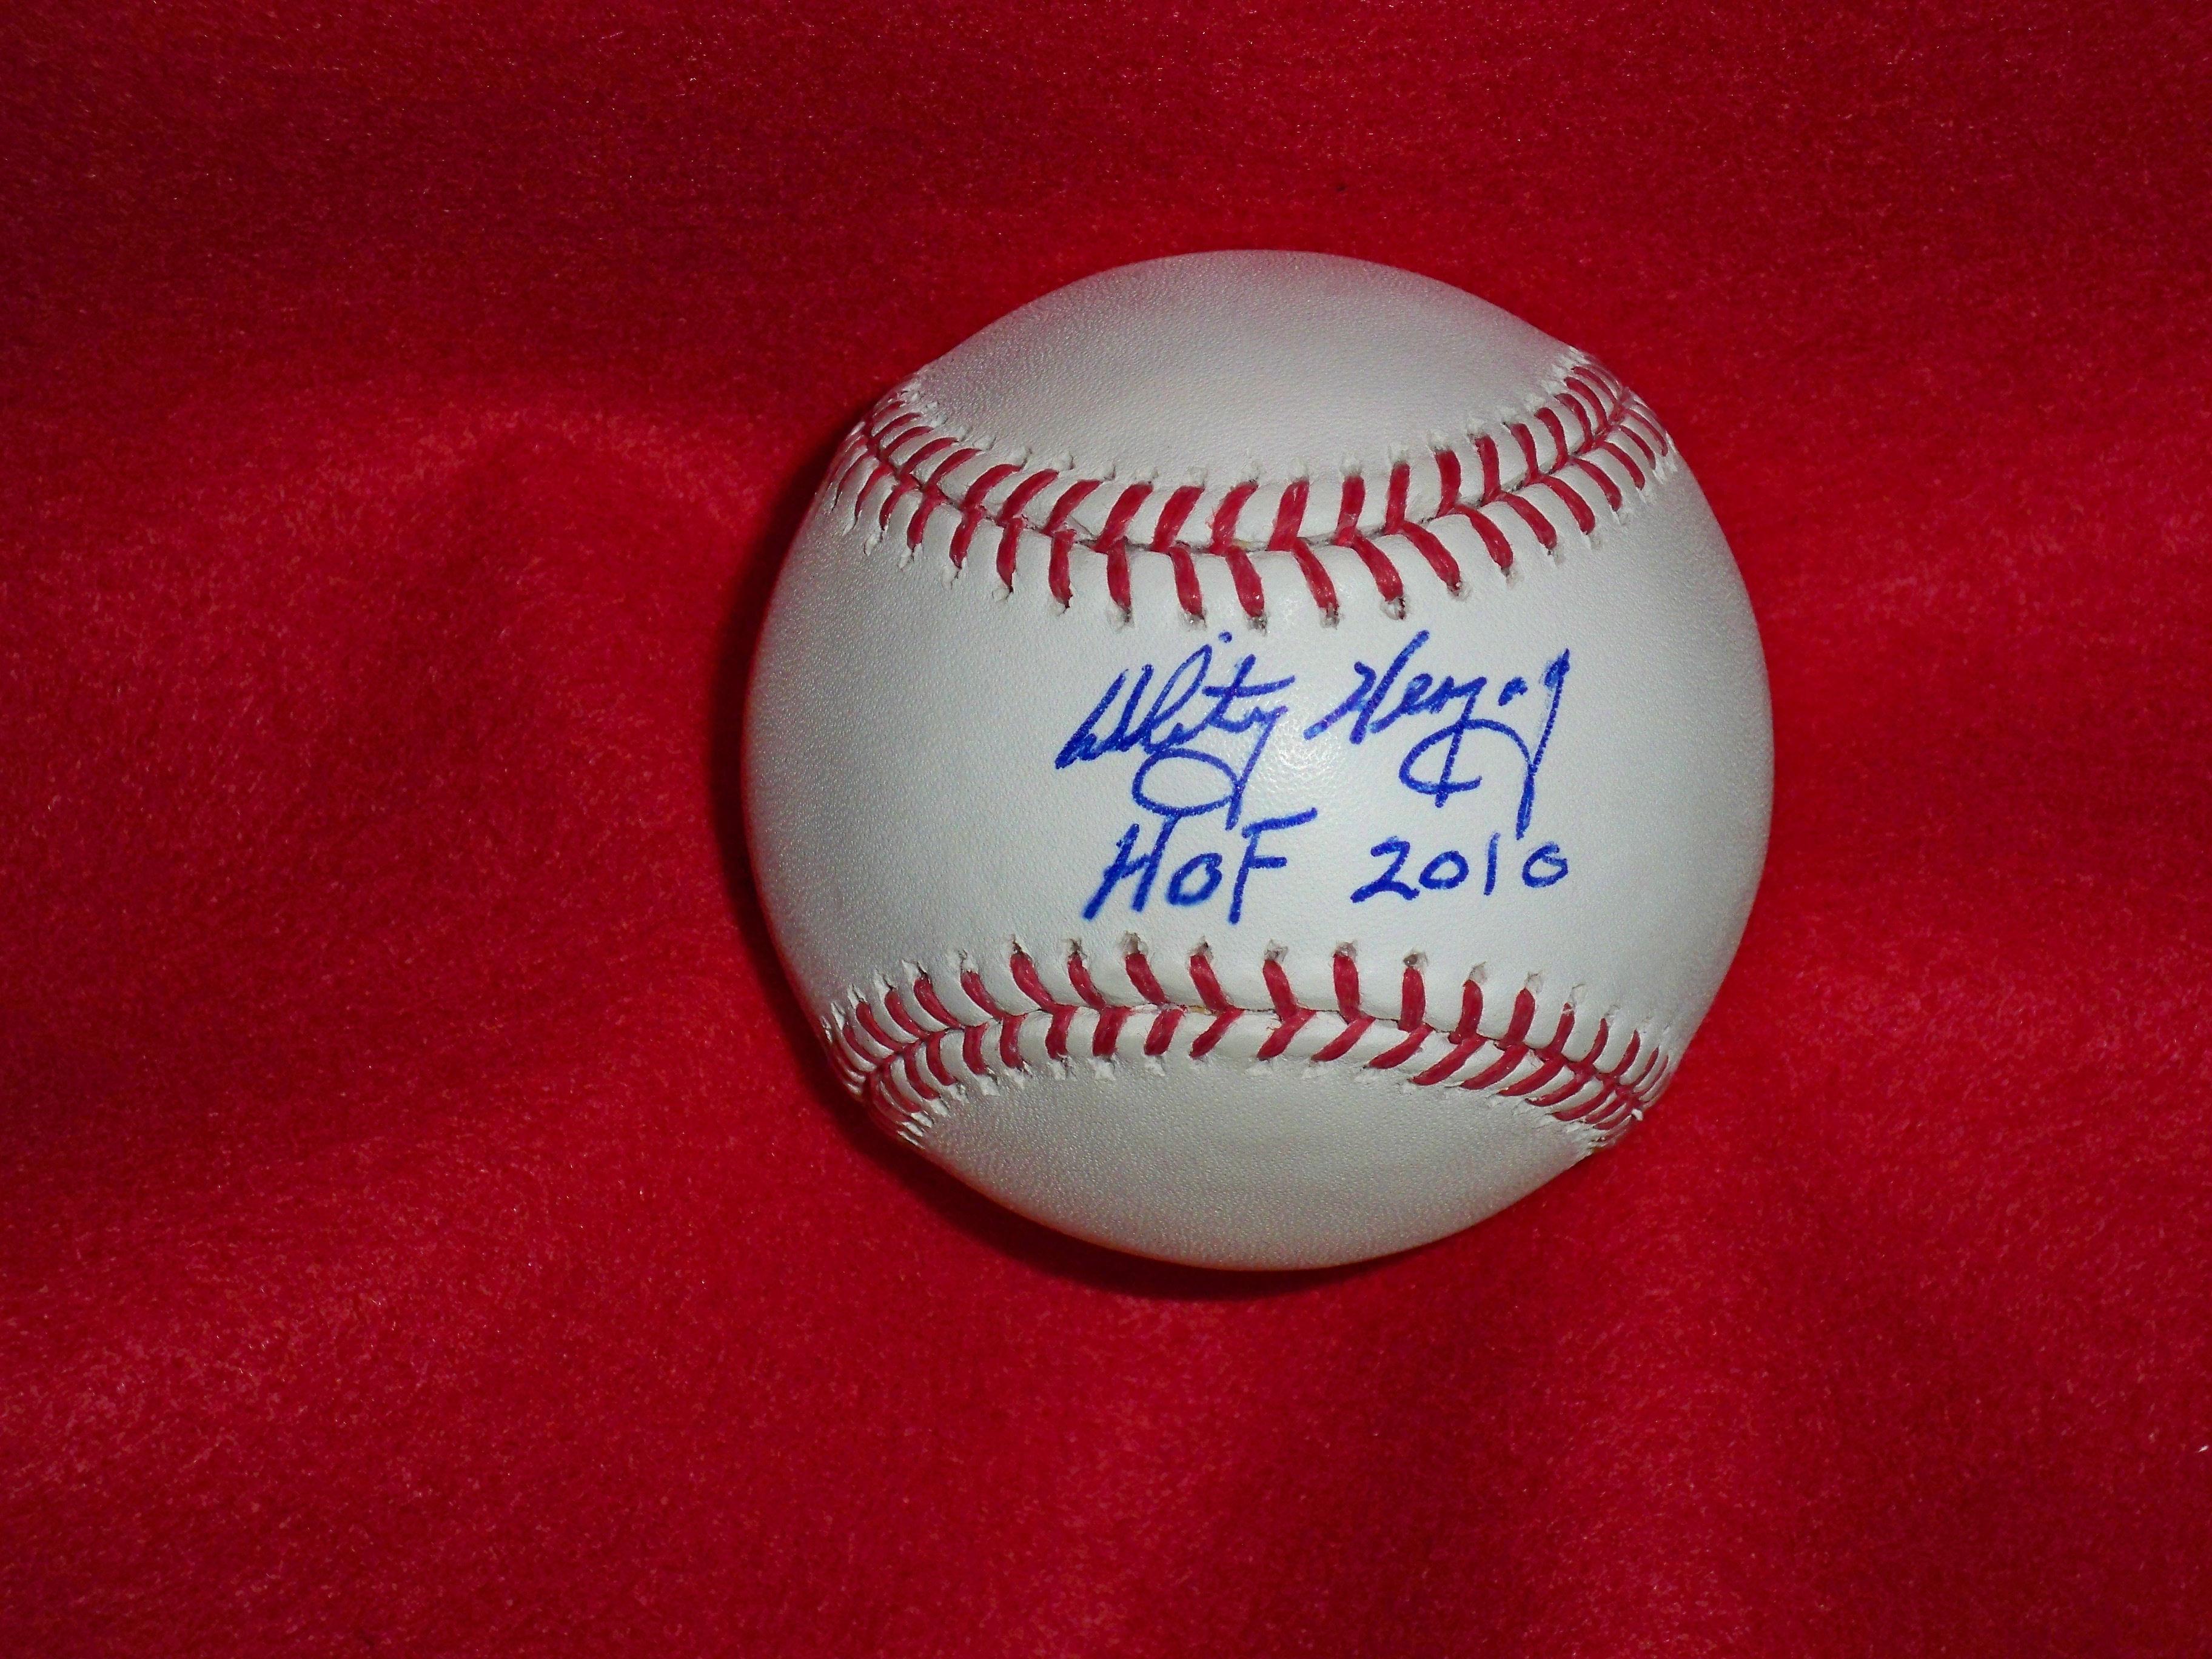 Auction Autographed Baseball